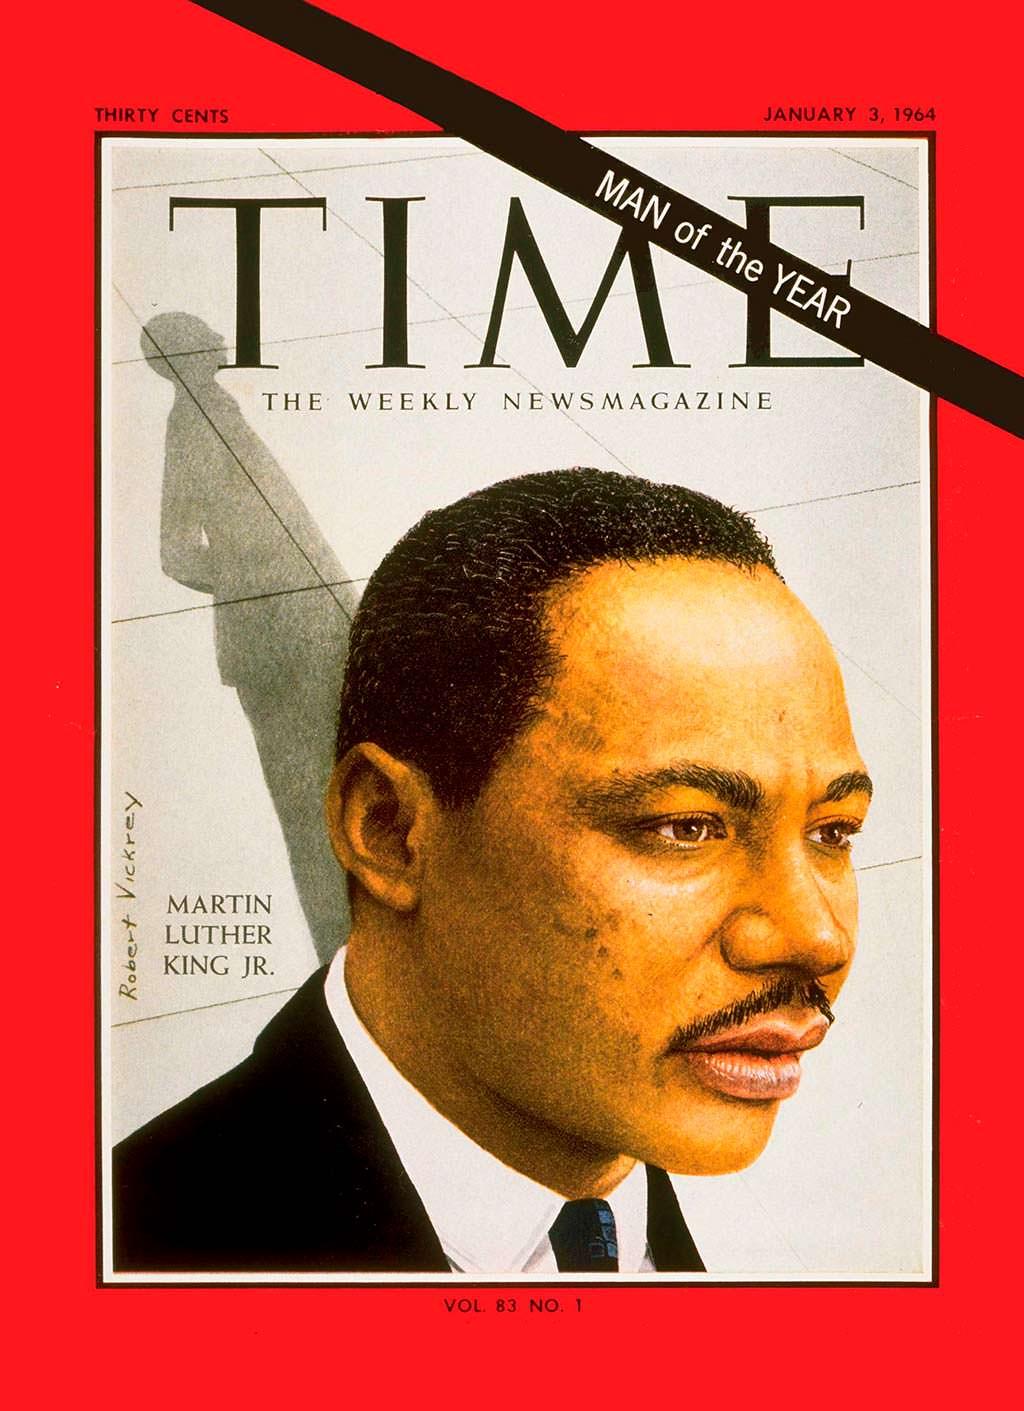 1963 год. Оратор Мартин Лютер Кинг на обложке Time